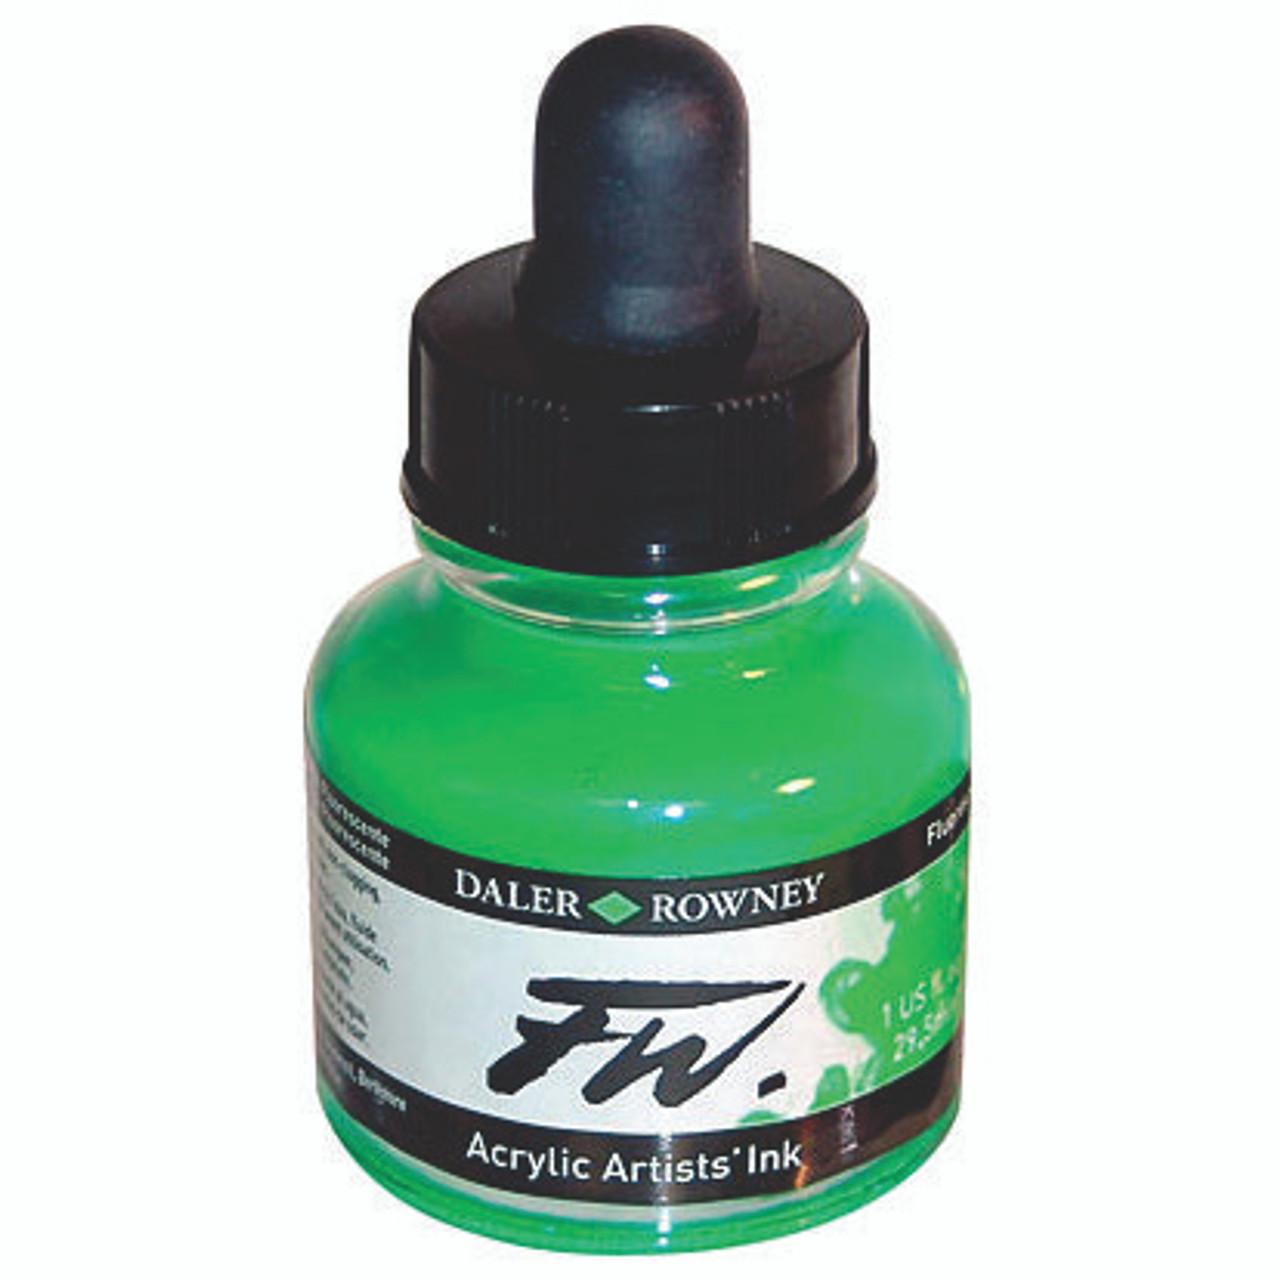 FW Acrylic Artists' Ink 29.5ml – Fluorescent Green #349